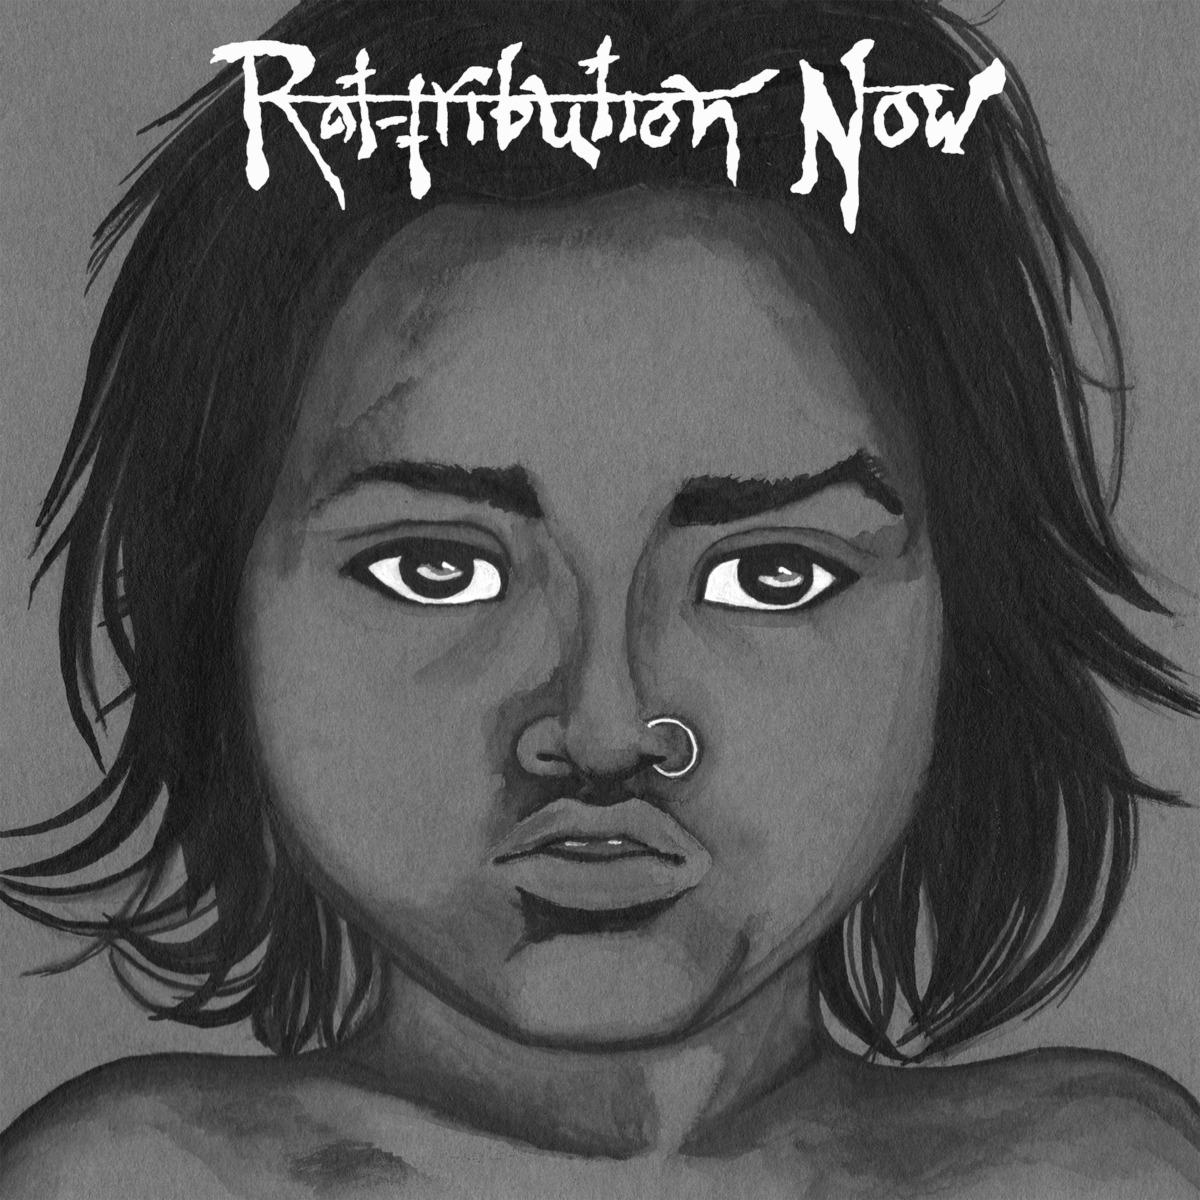 »Rat-Tribution Now« (Illustration: Saba Lou Khan)